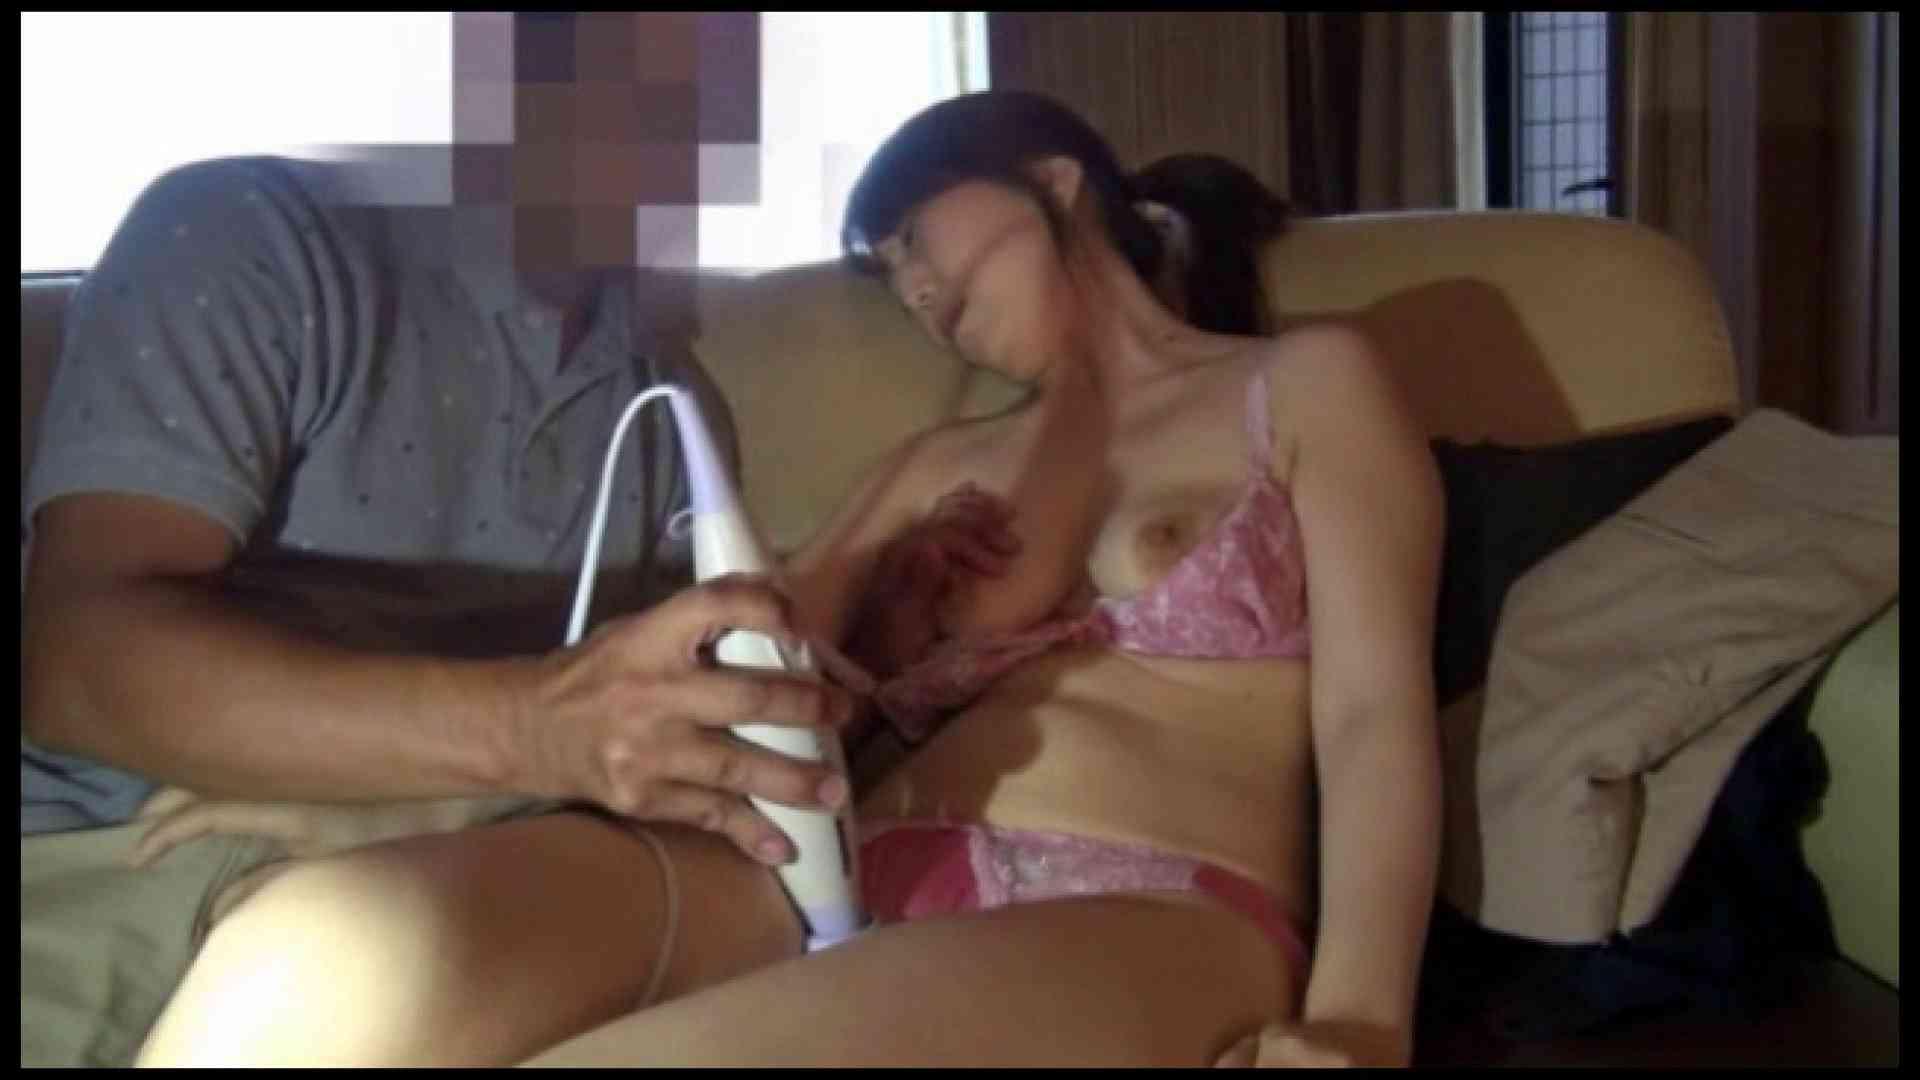 ハメ撮り天国 Vol.12 前編 OL裸体 | 流出作品  77画像 13